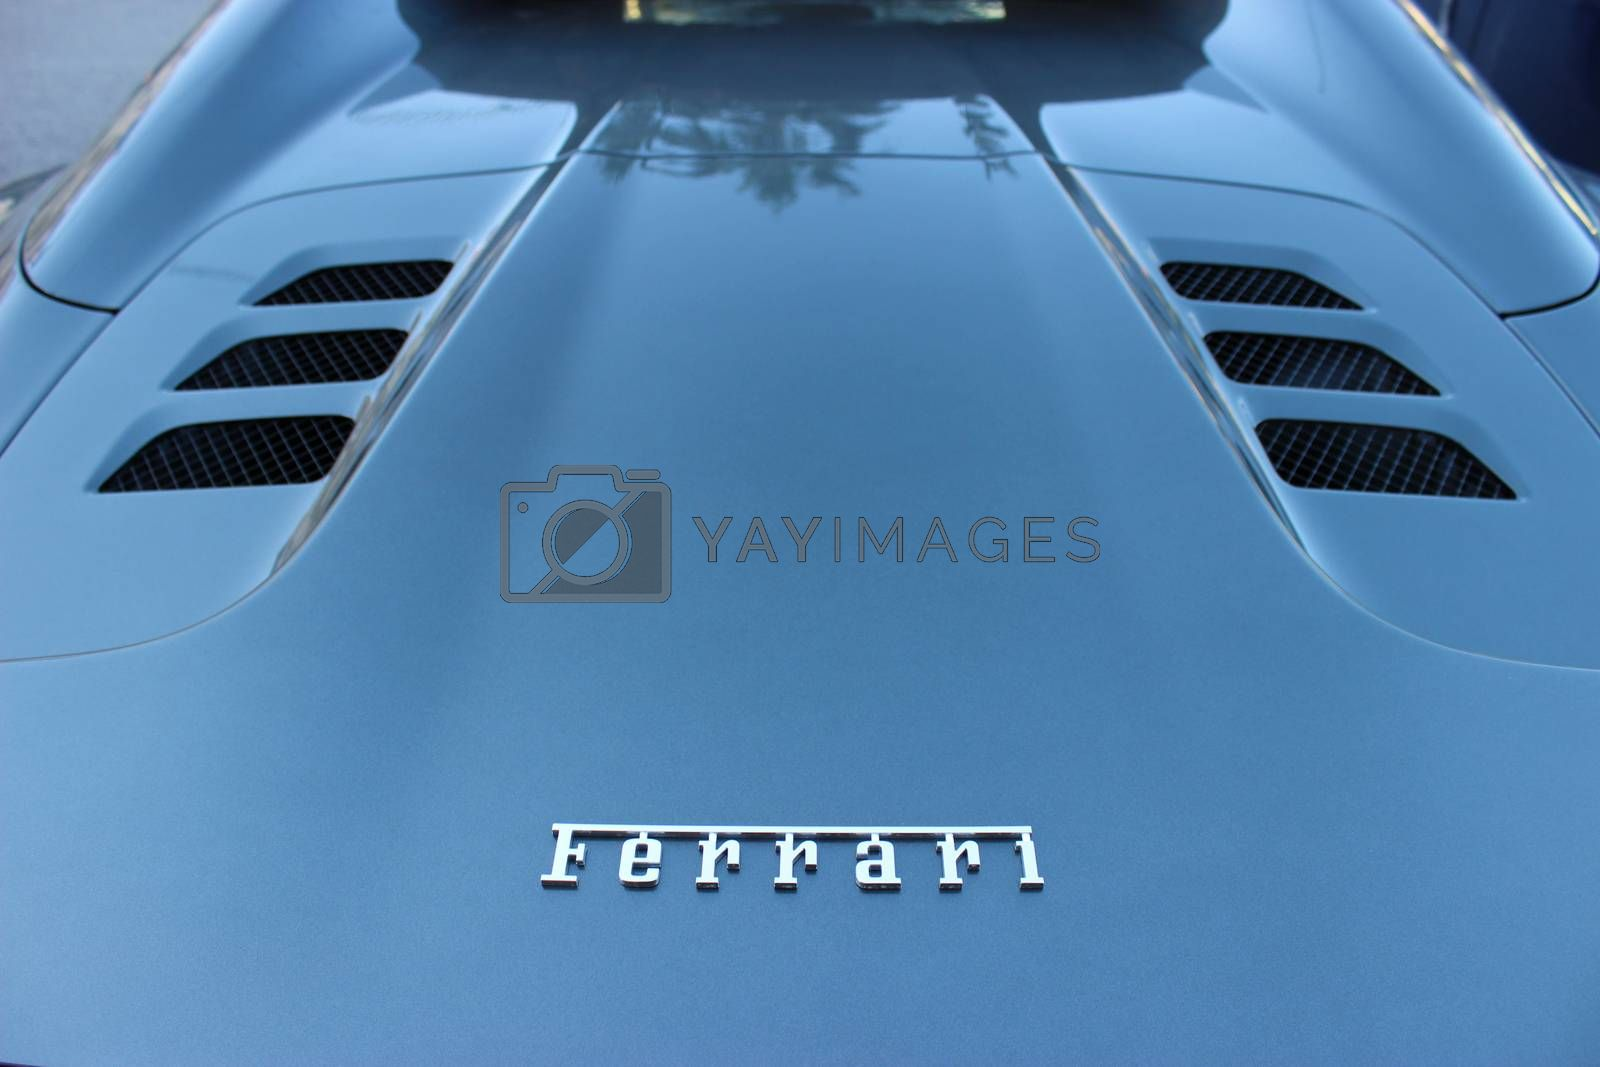 Royalty free image of Logo of Ferrari on a Cowl by bensib